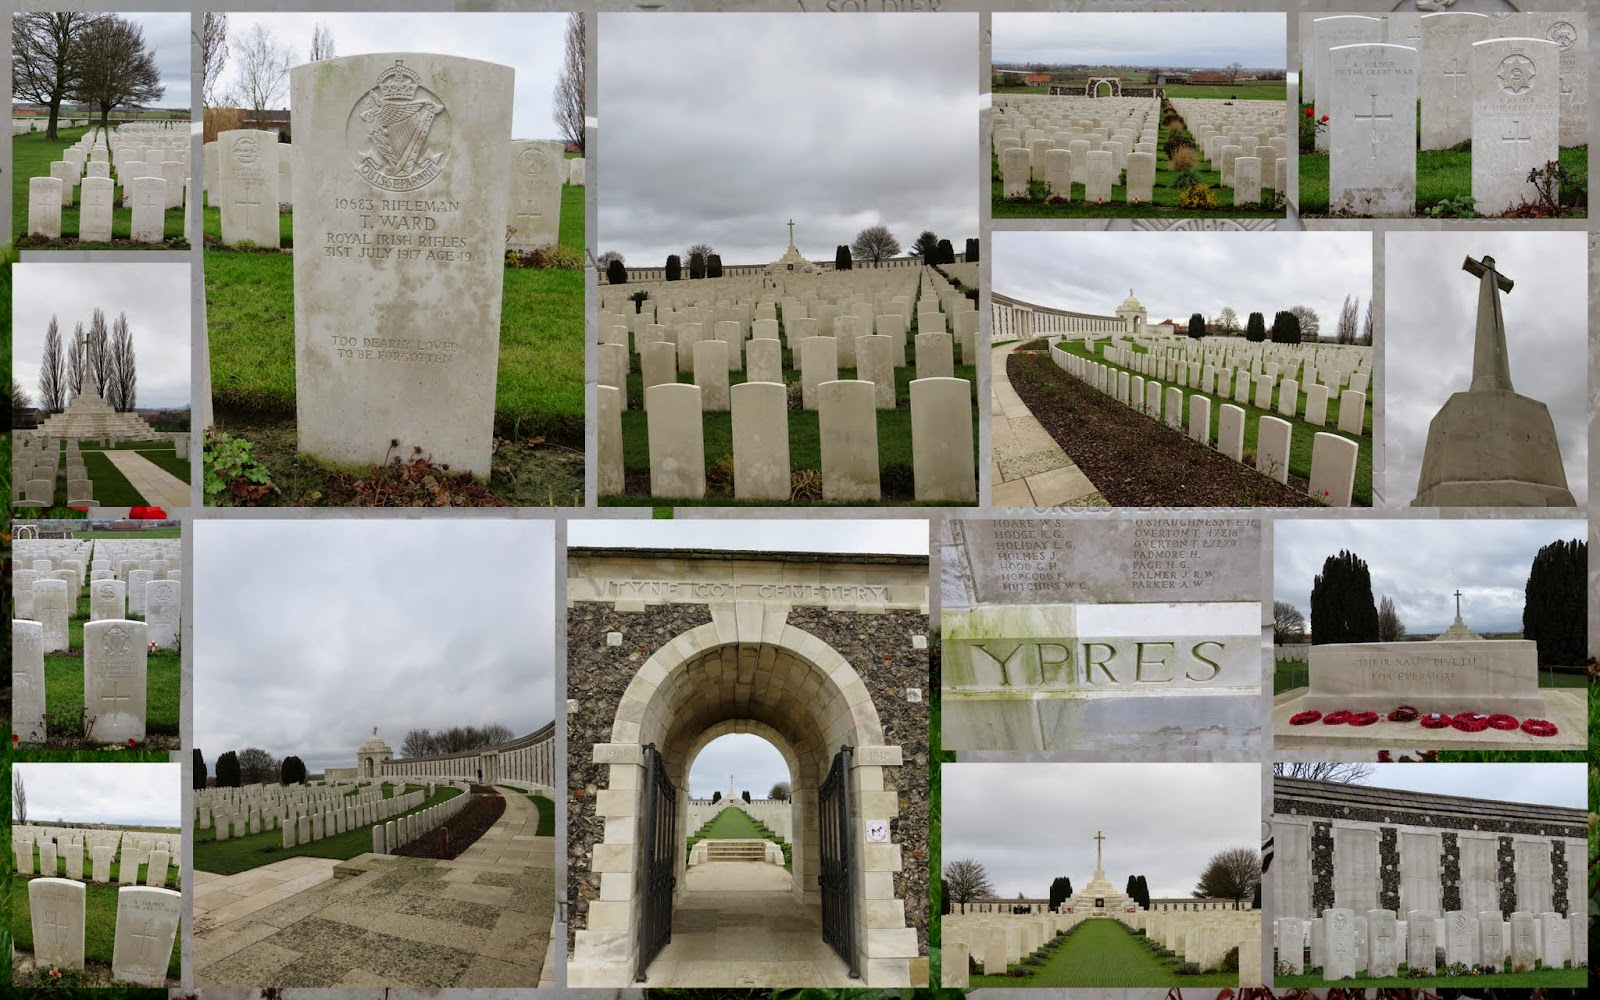 Tyne Cot Cemetery - Flanders Fields